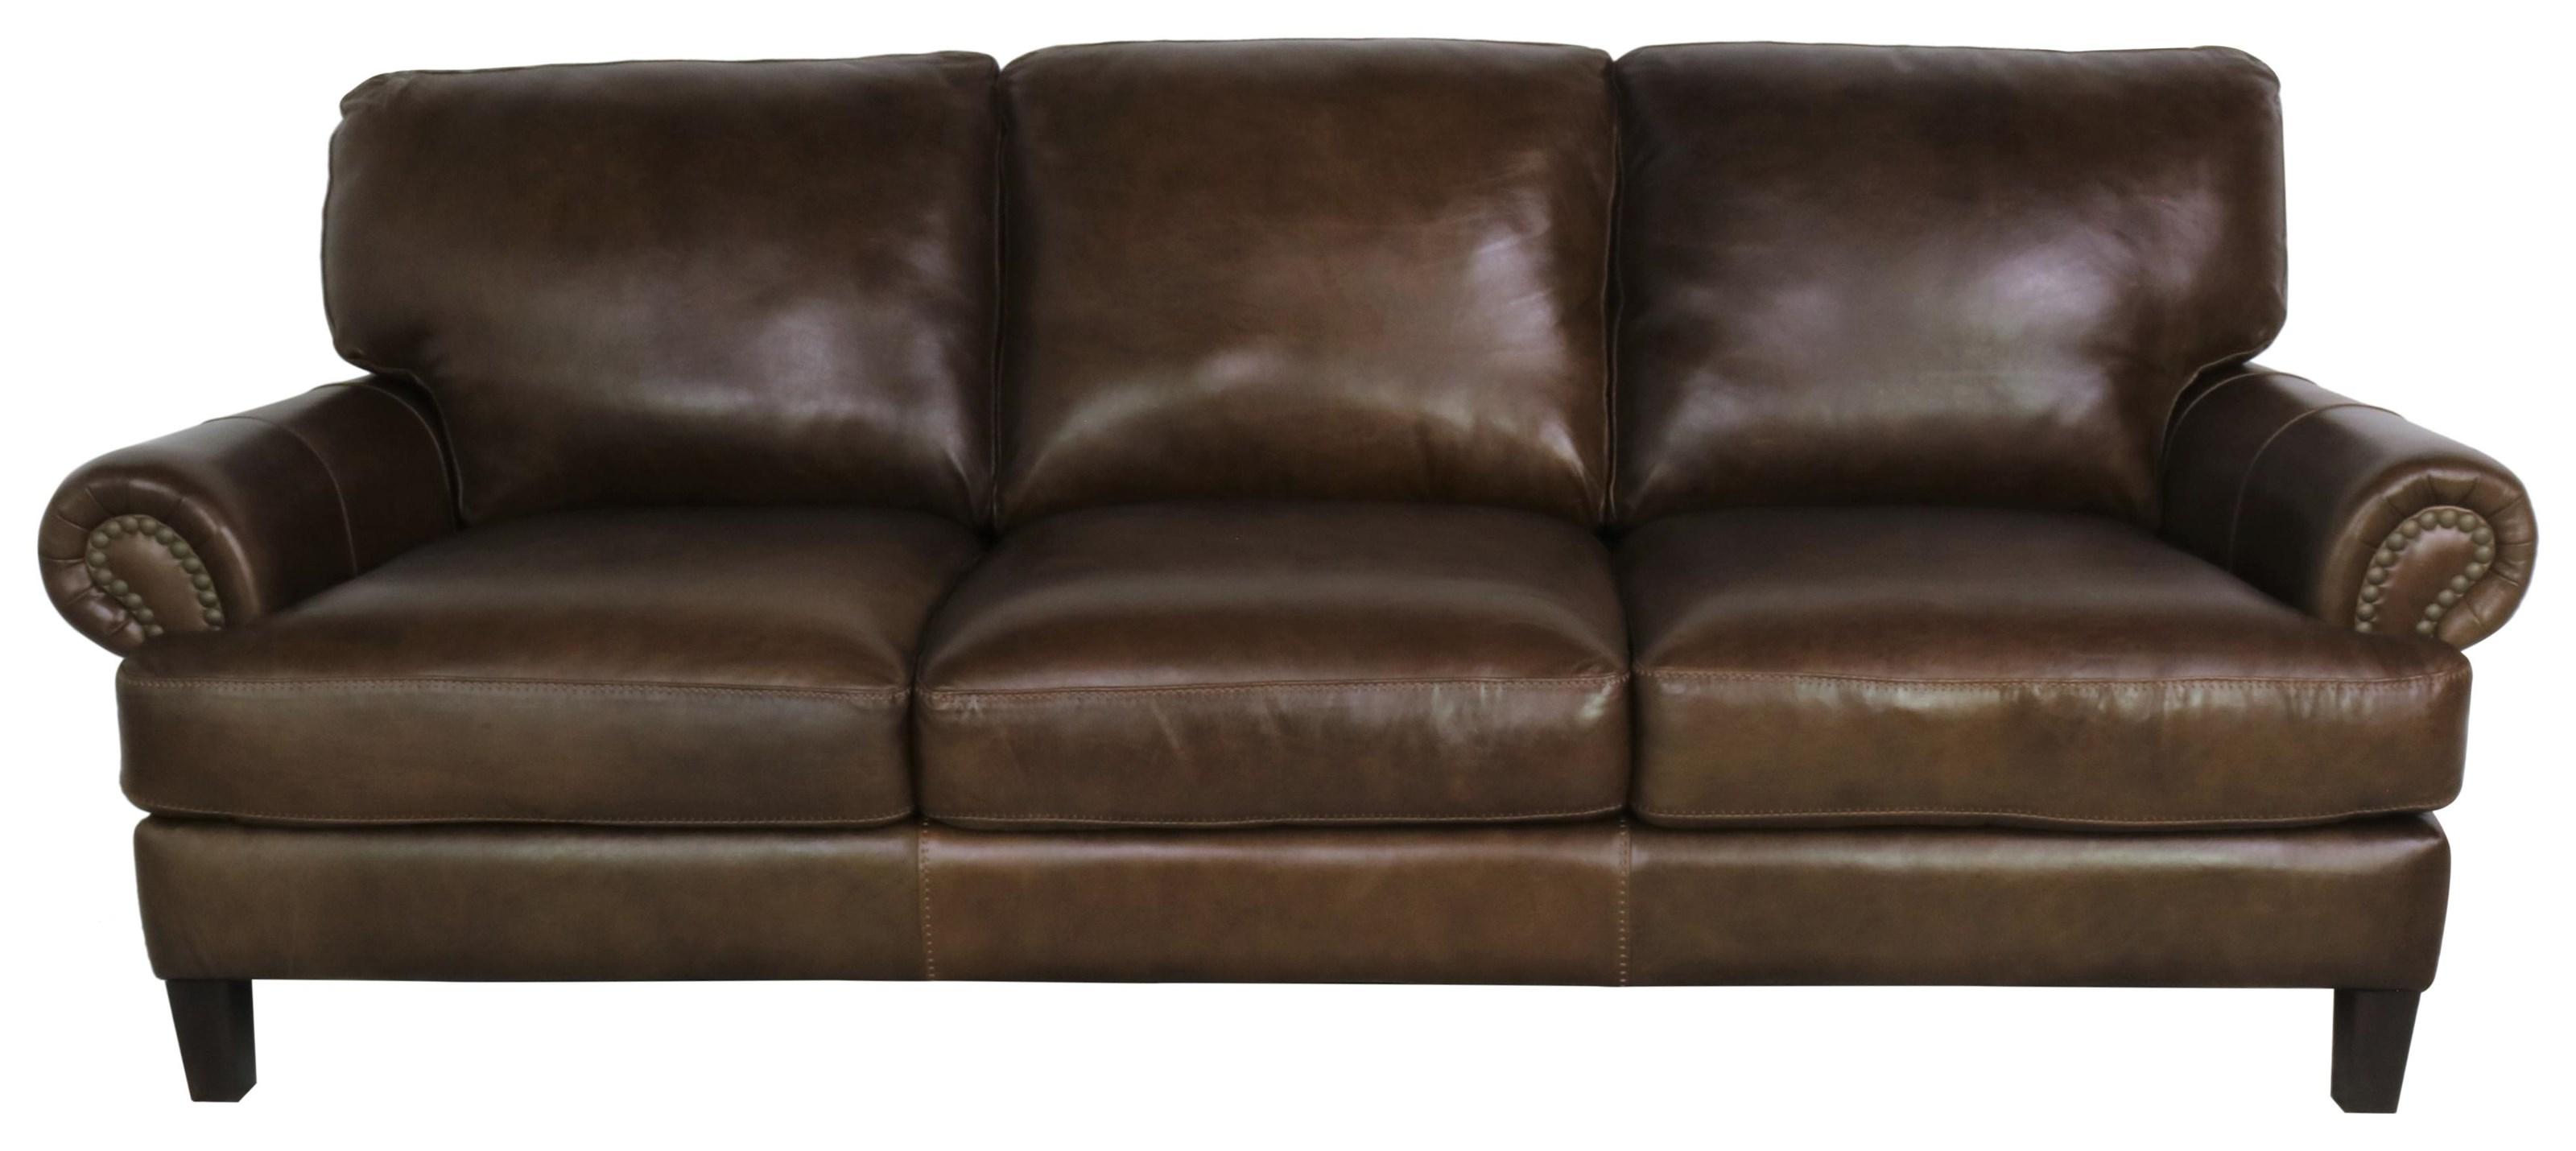 7386 Italian Leather Sofa by Giovanni Leather at Sprintz Furniture